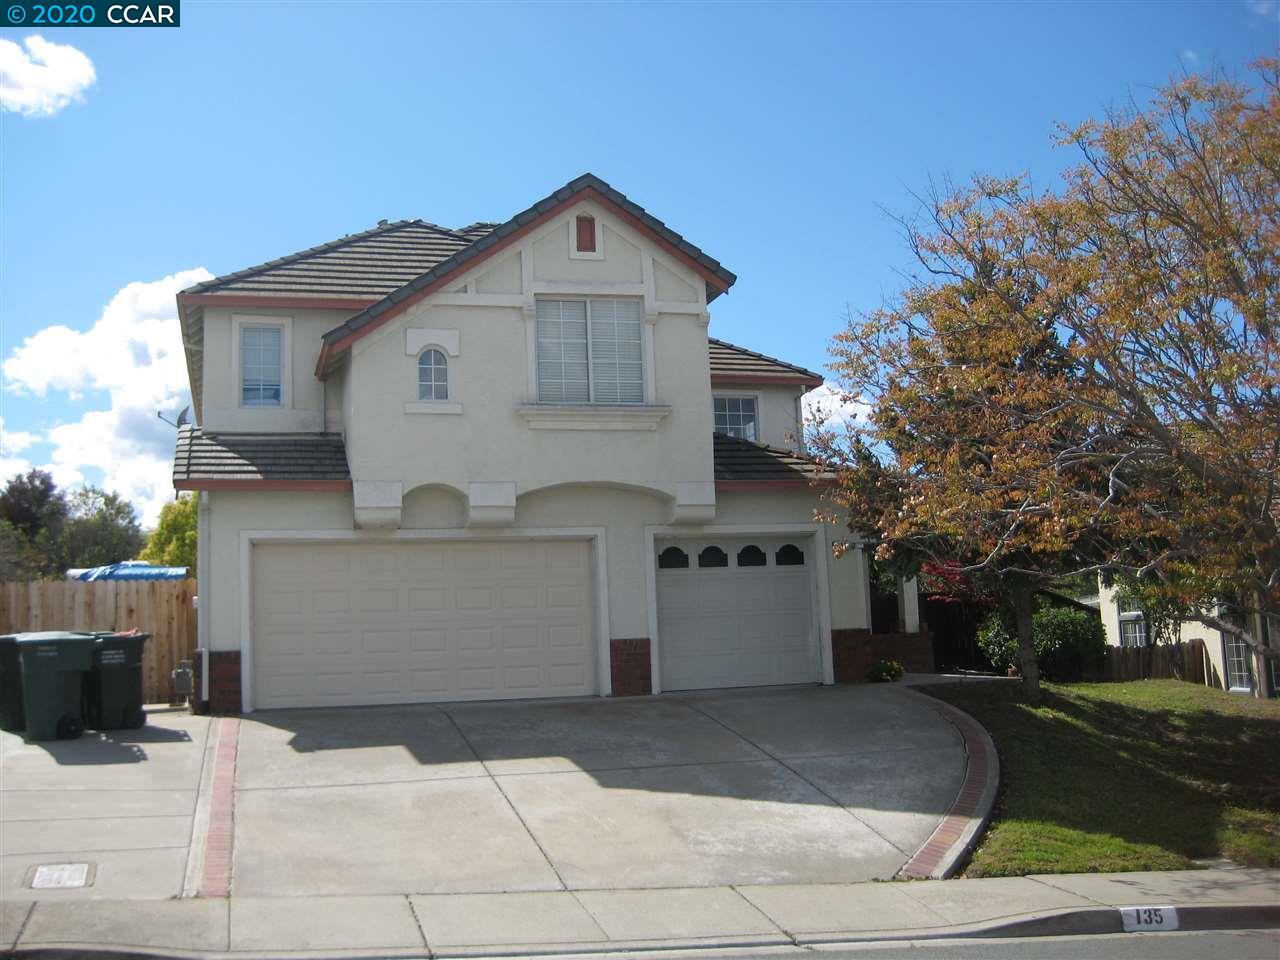 135 GREENMEADOW CIR, PITTSBURG, CA 94565